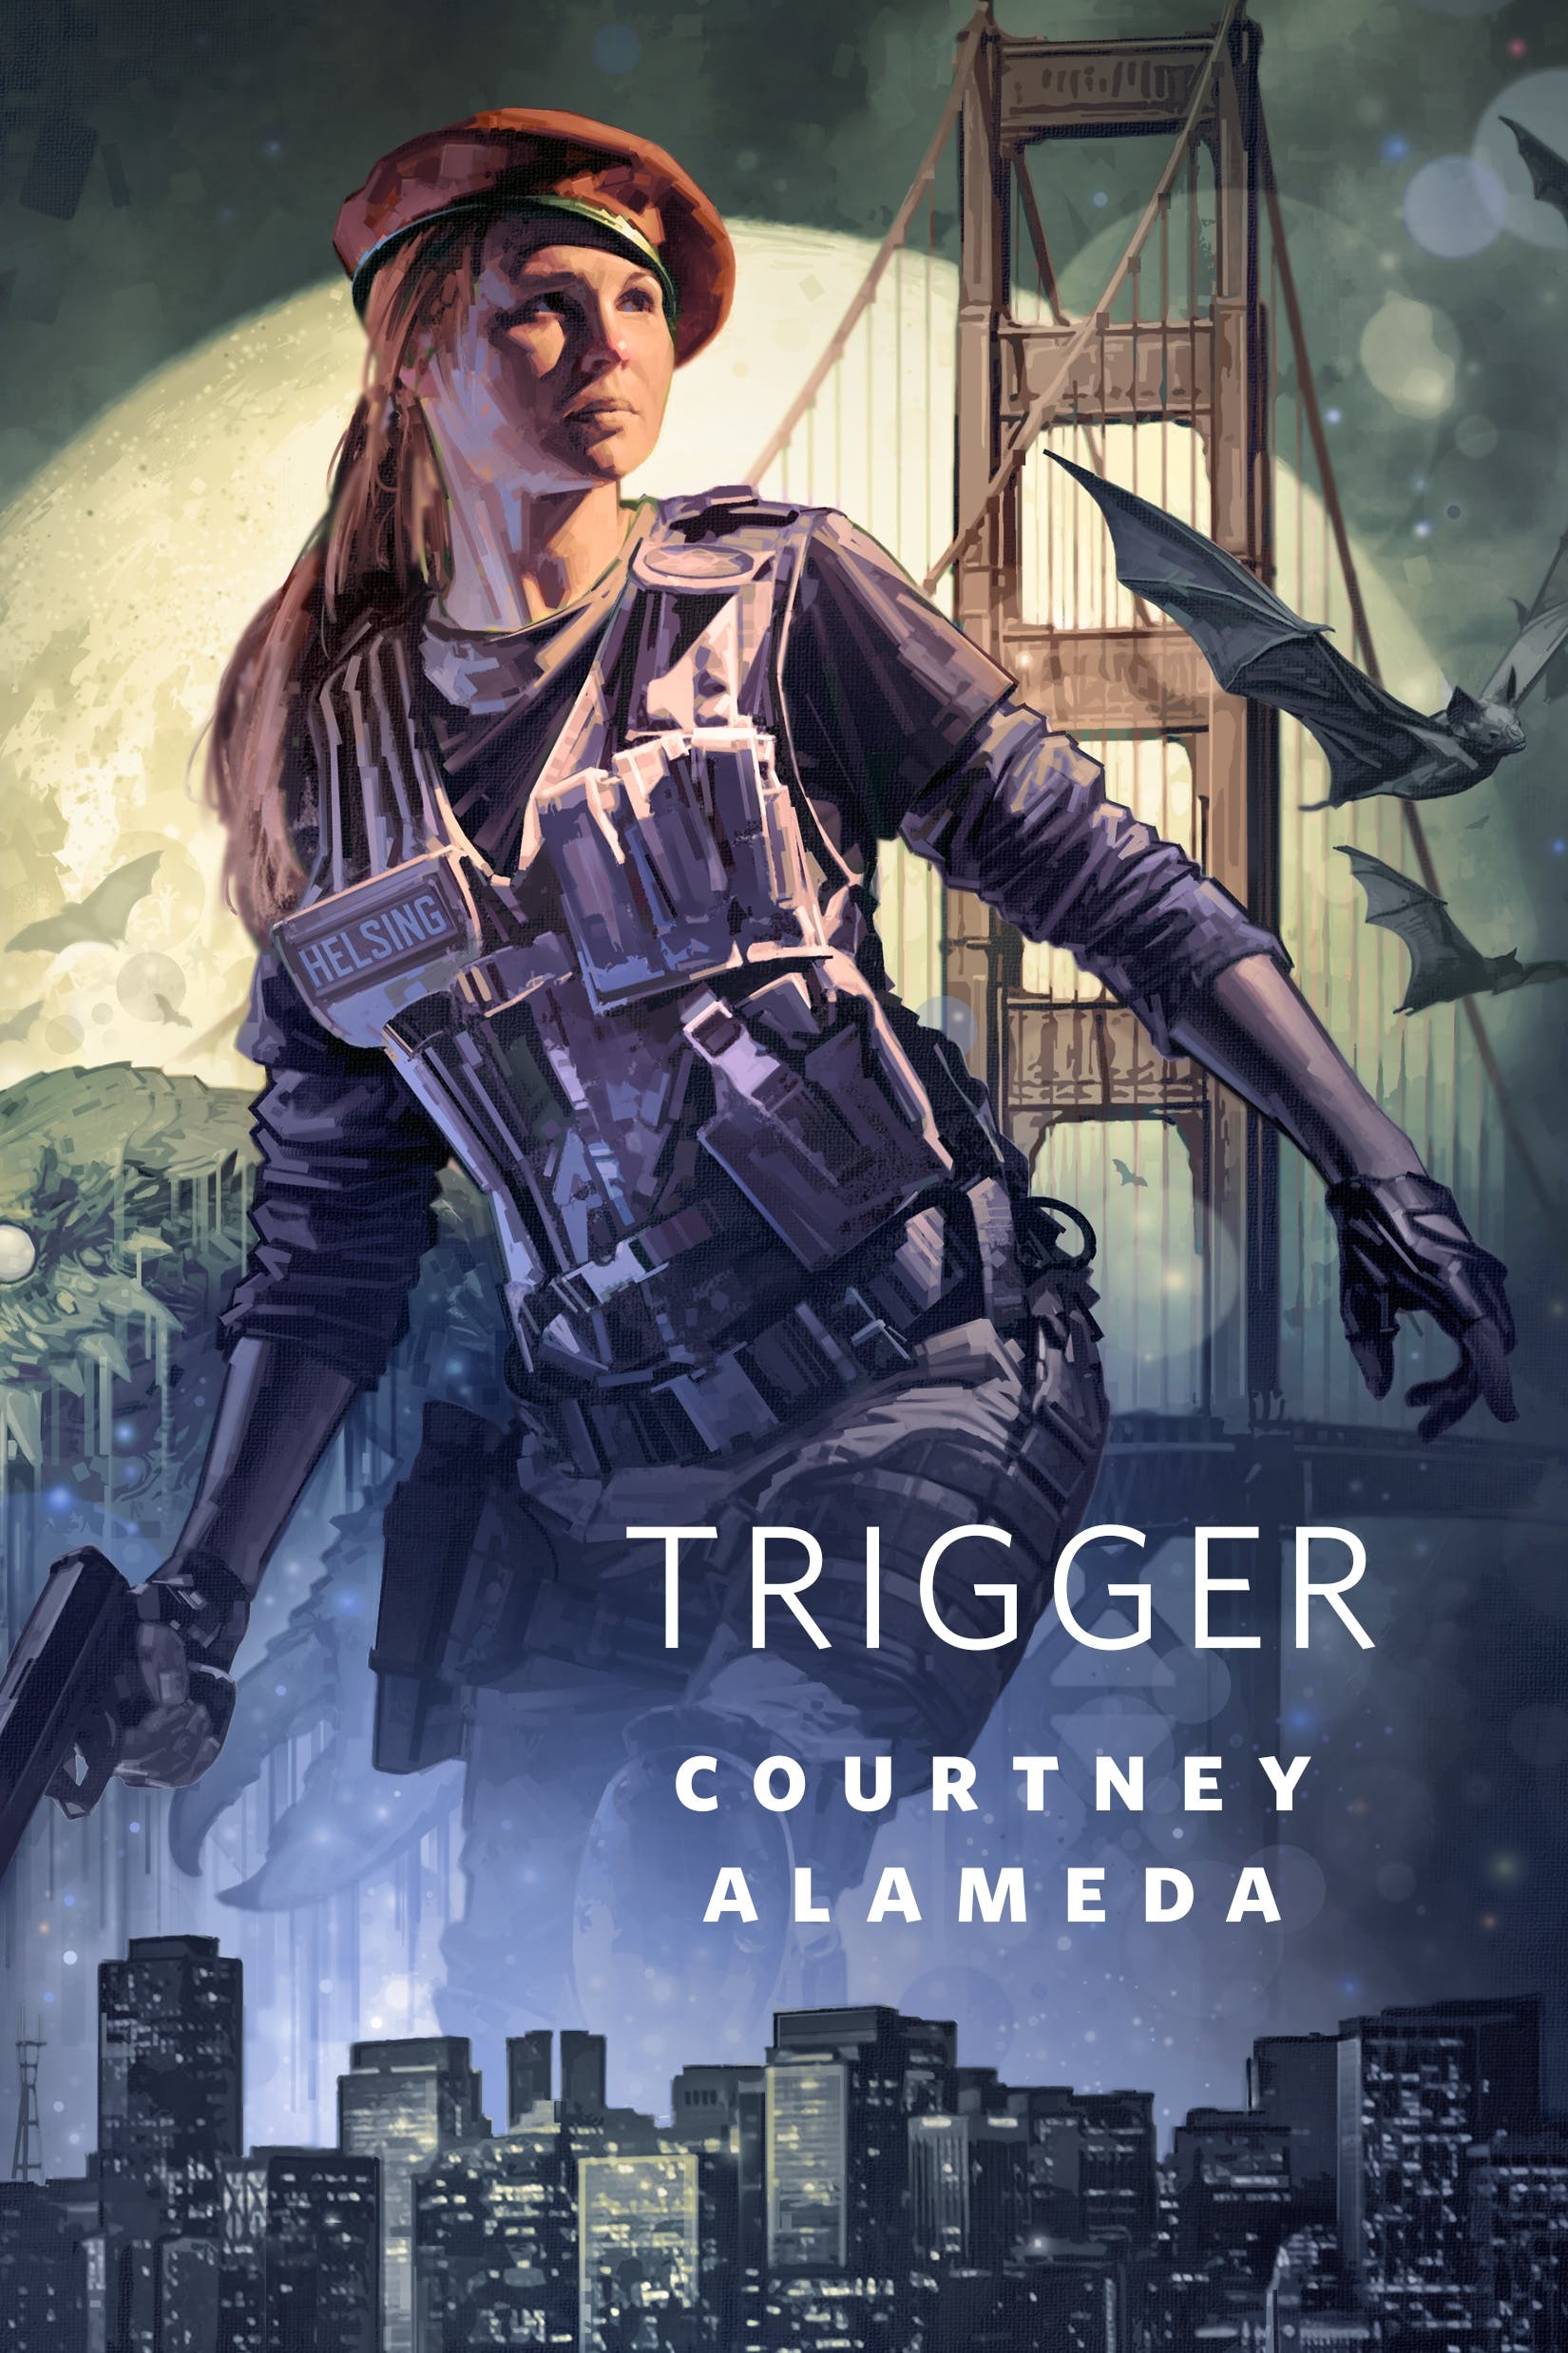 Image of Trigger